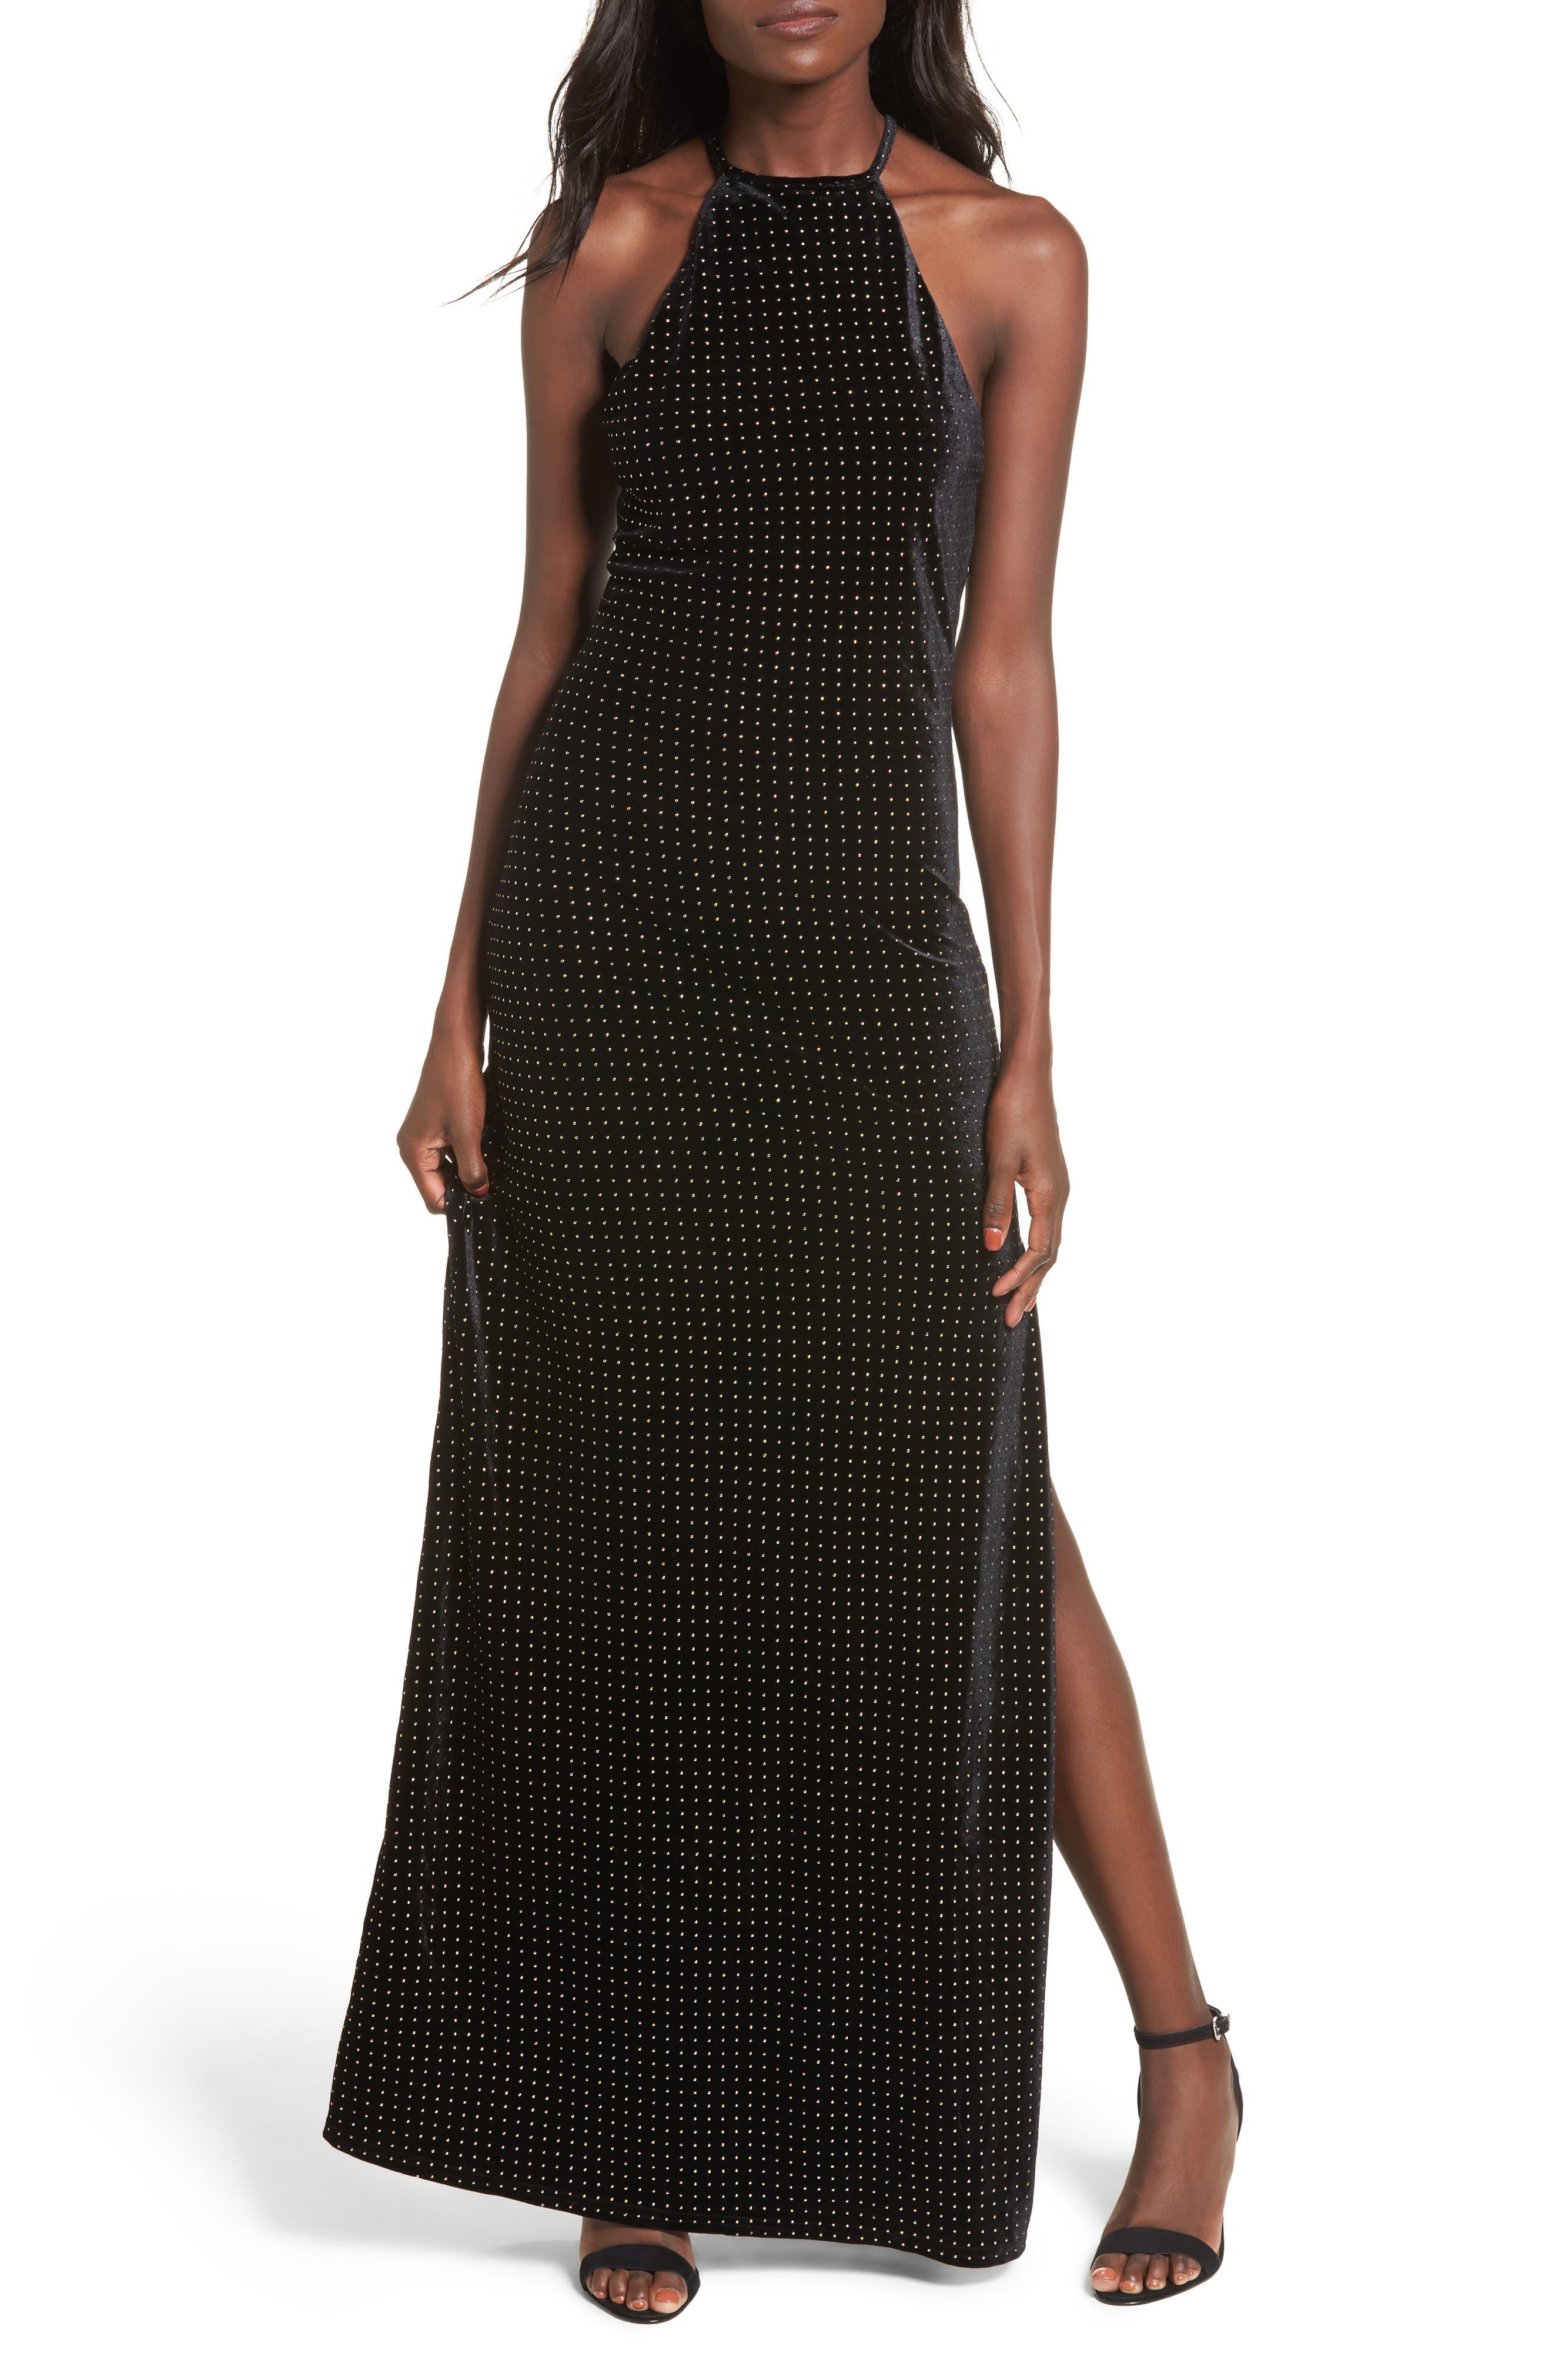 Crenshaw Studded Velvet Gown,                             Main thumbnail 1, color,                             002